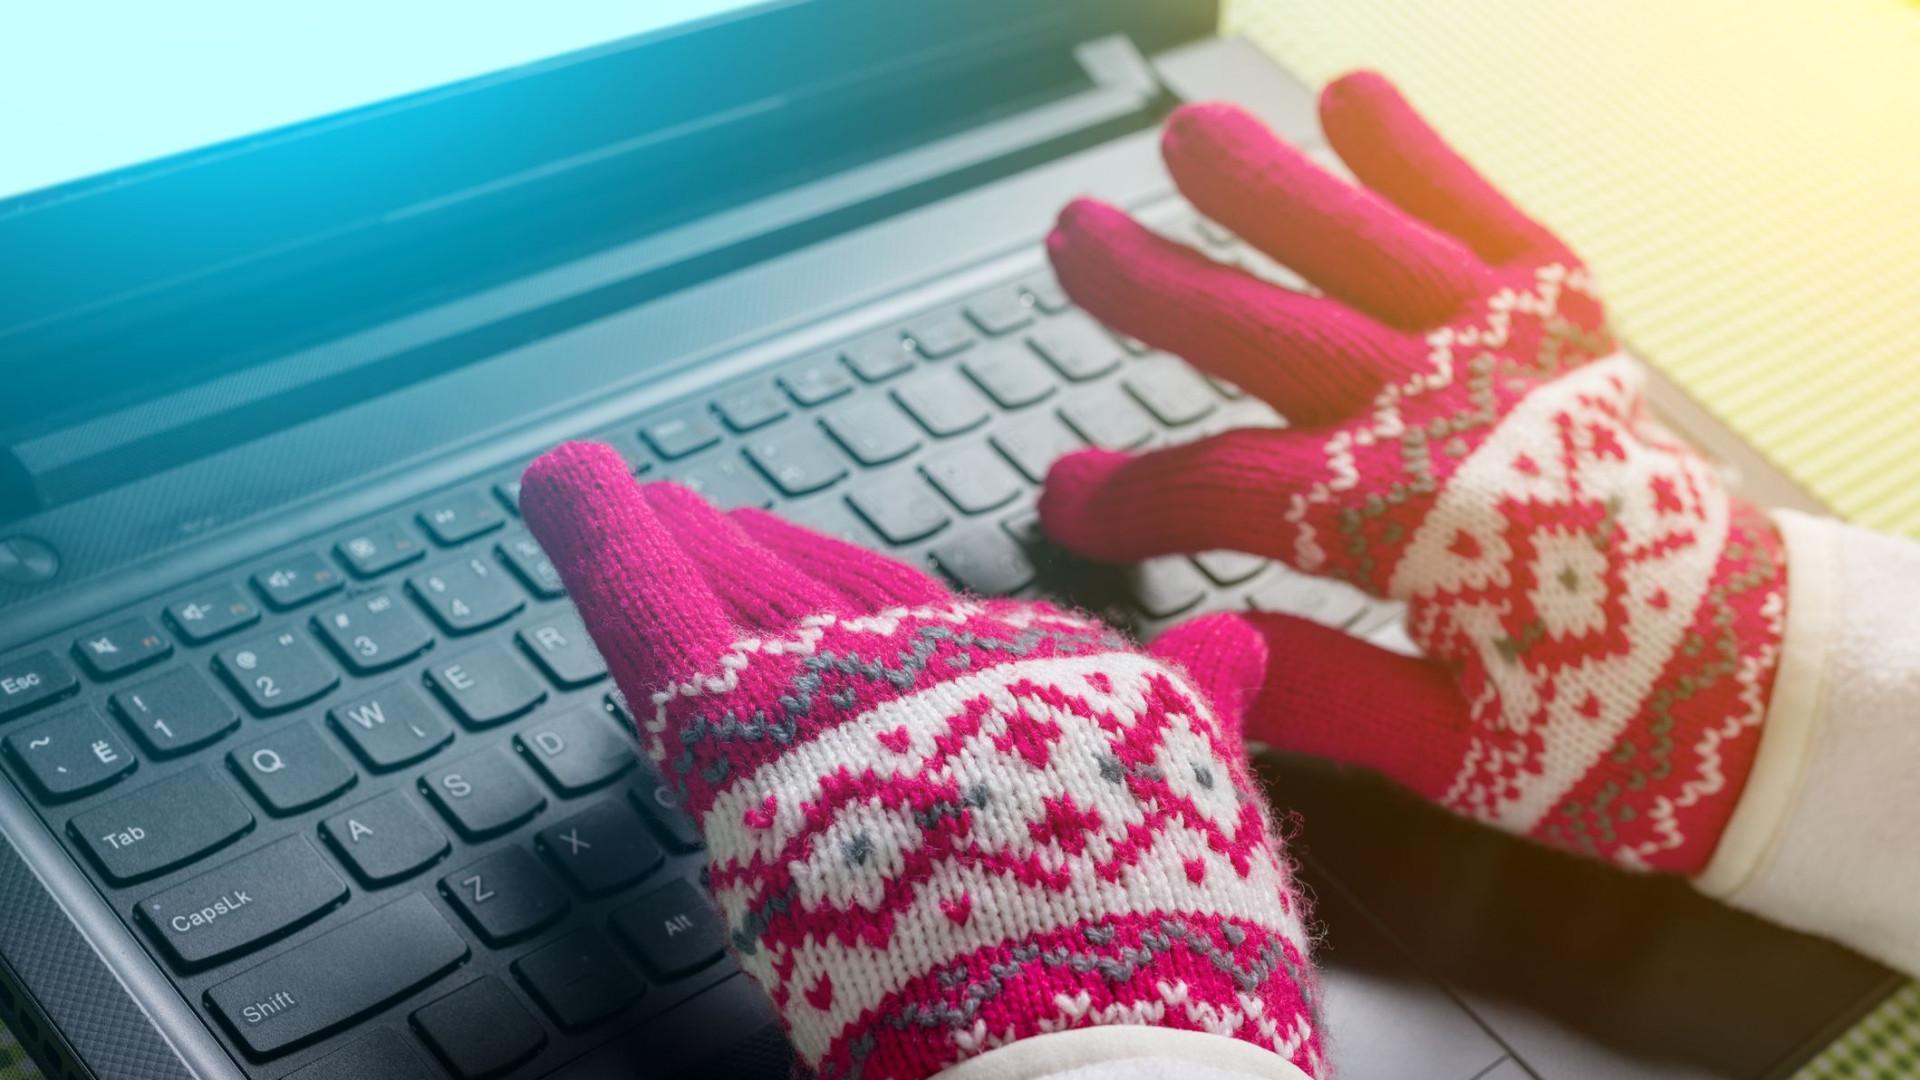 Alunos de Leiria levam mantas para a escola para enfrentar o frio